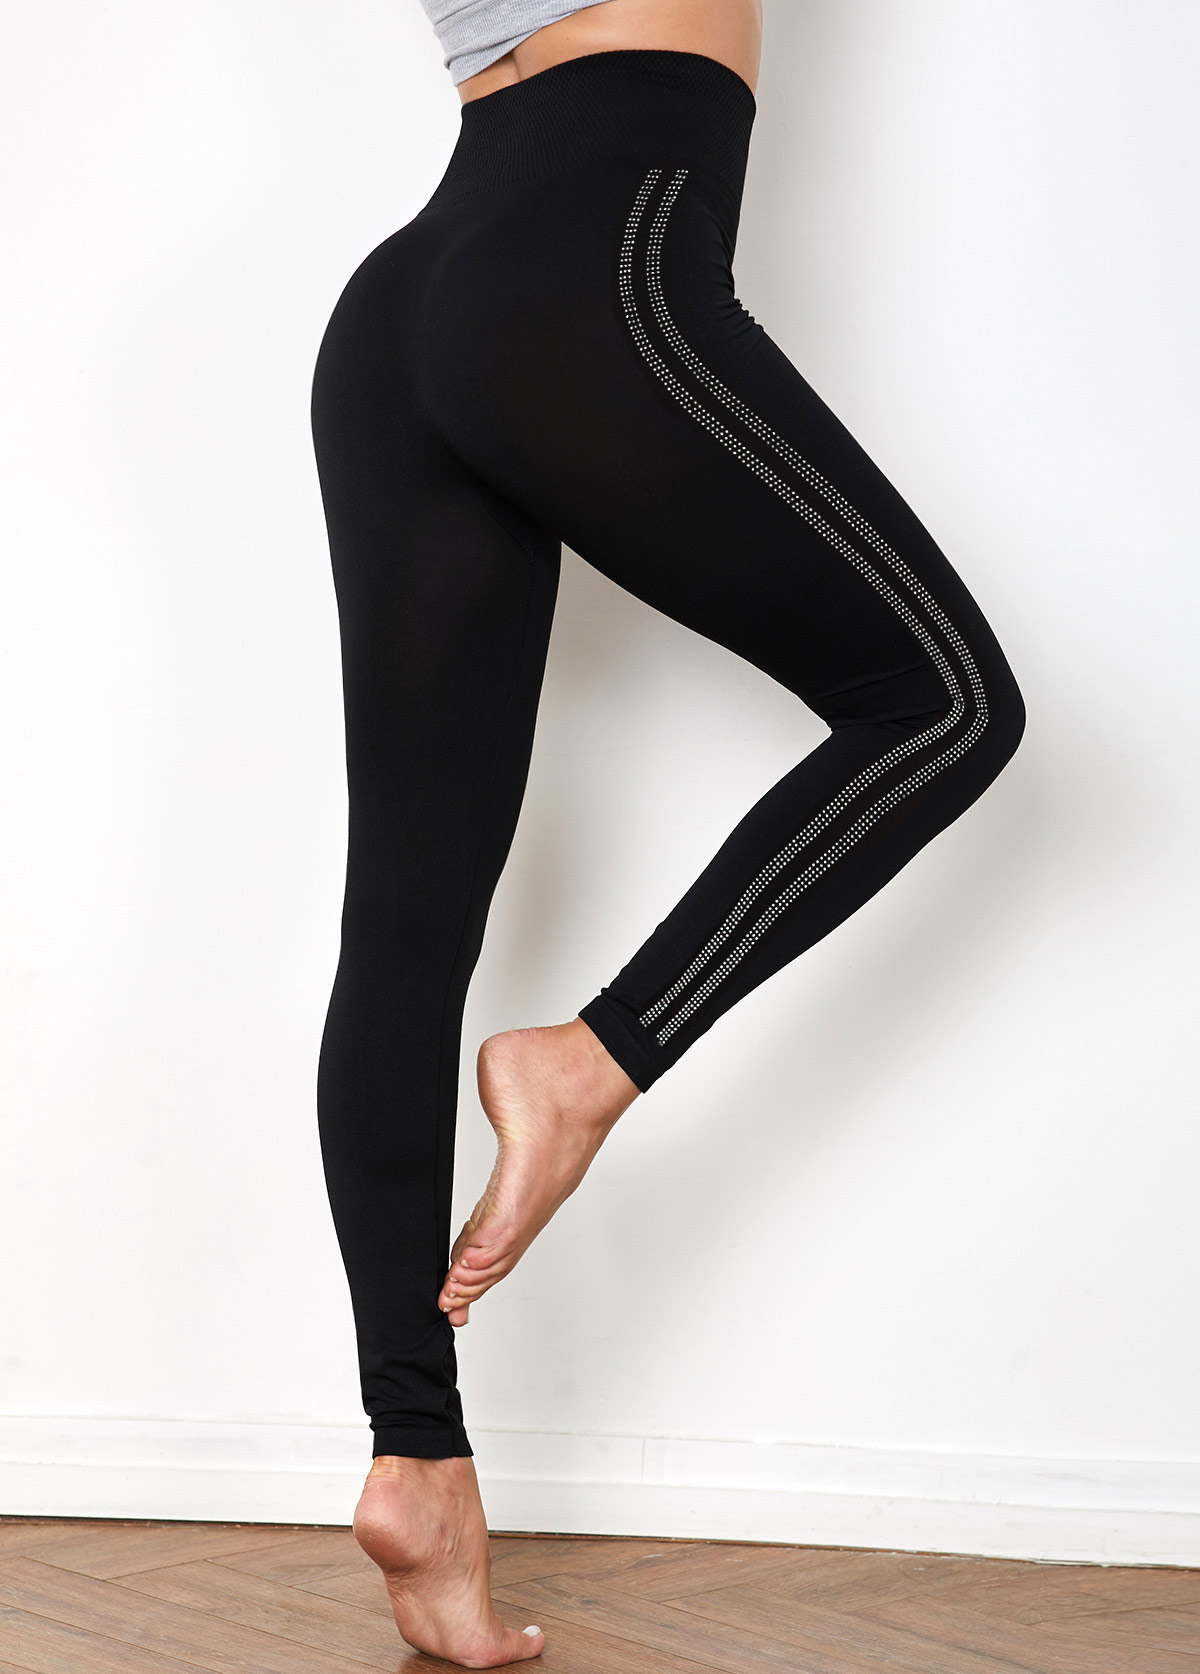 High Waist Hot Drilling Super Elastic Legging Pants